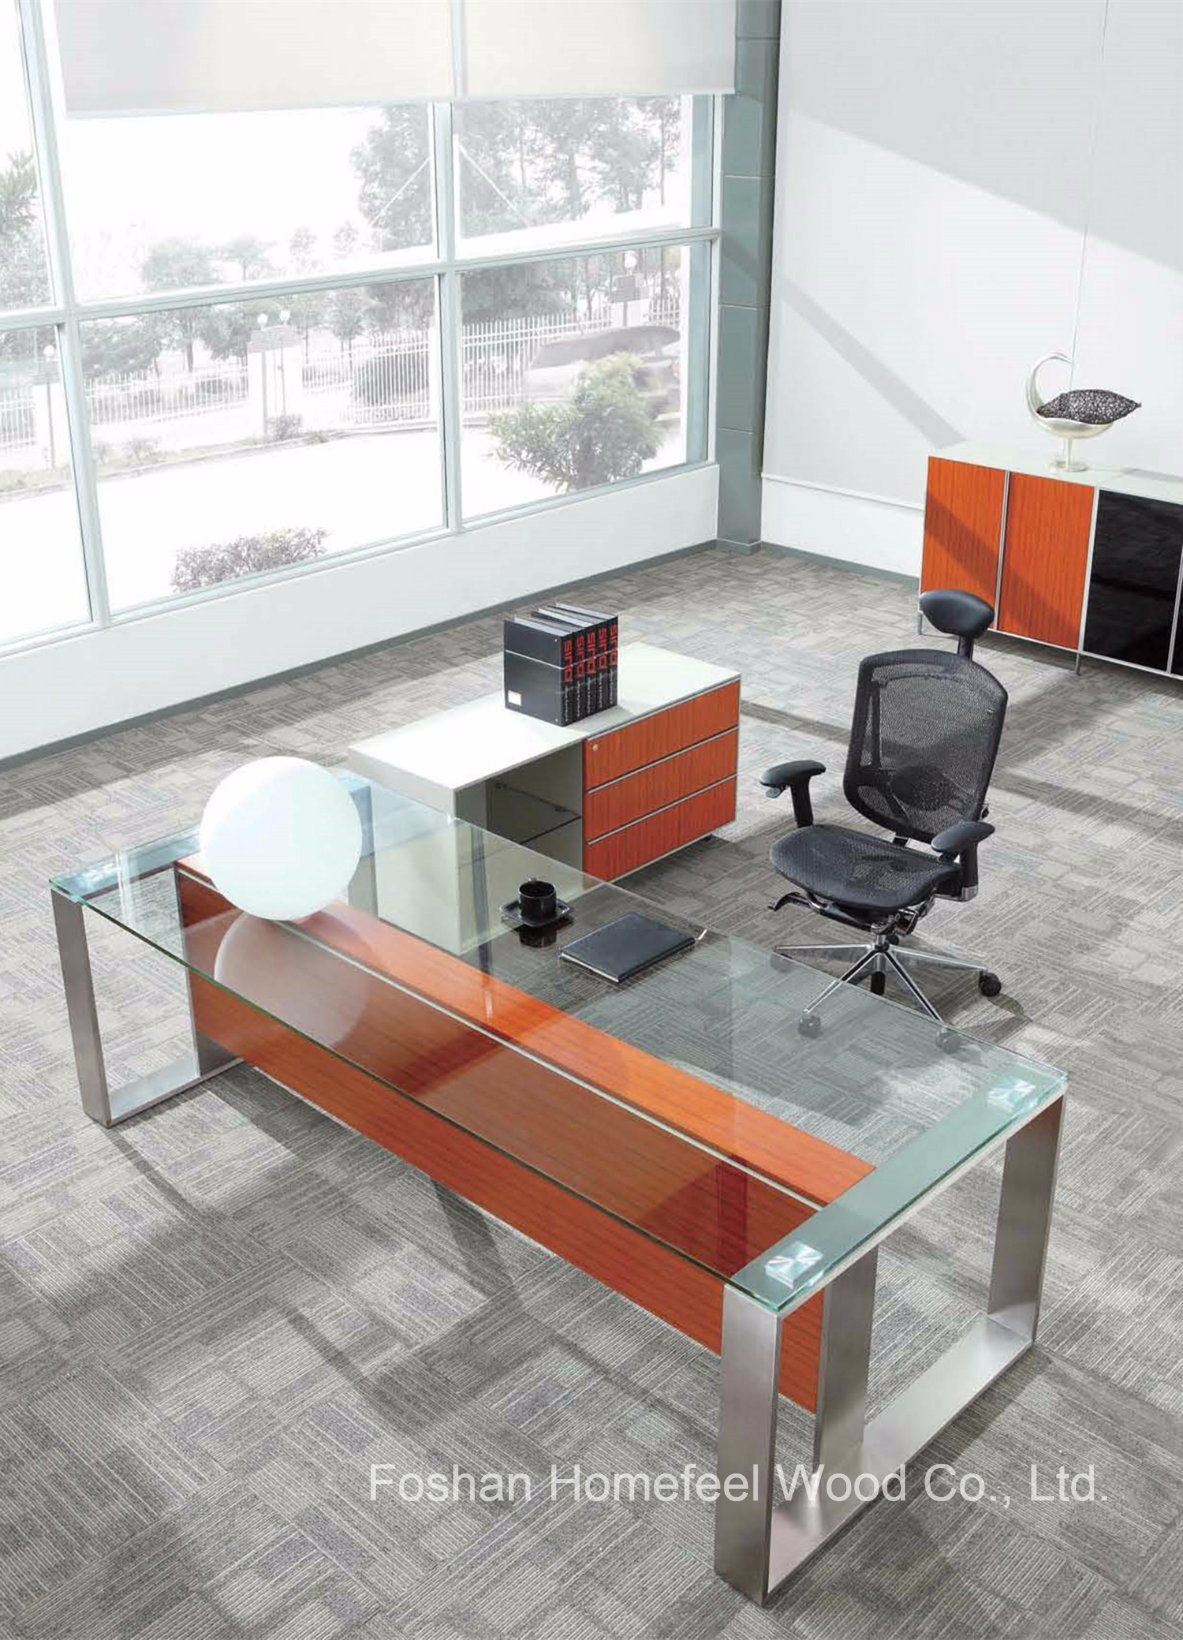 China Hot Modern Office Furniture Executive Glass Desk Hf Sia002 Table